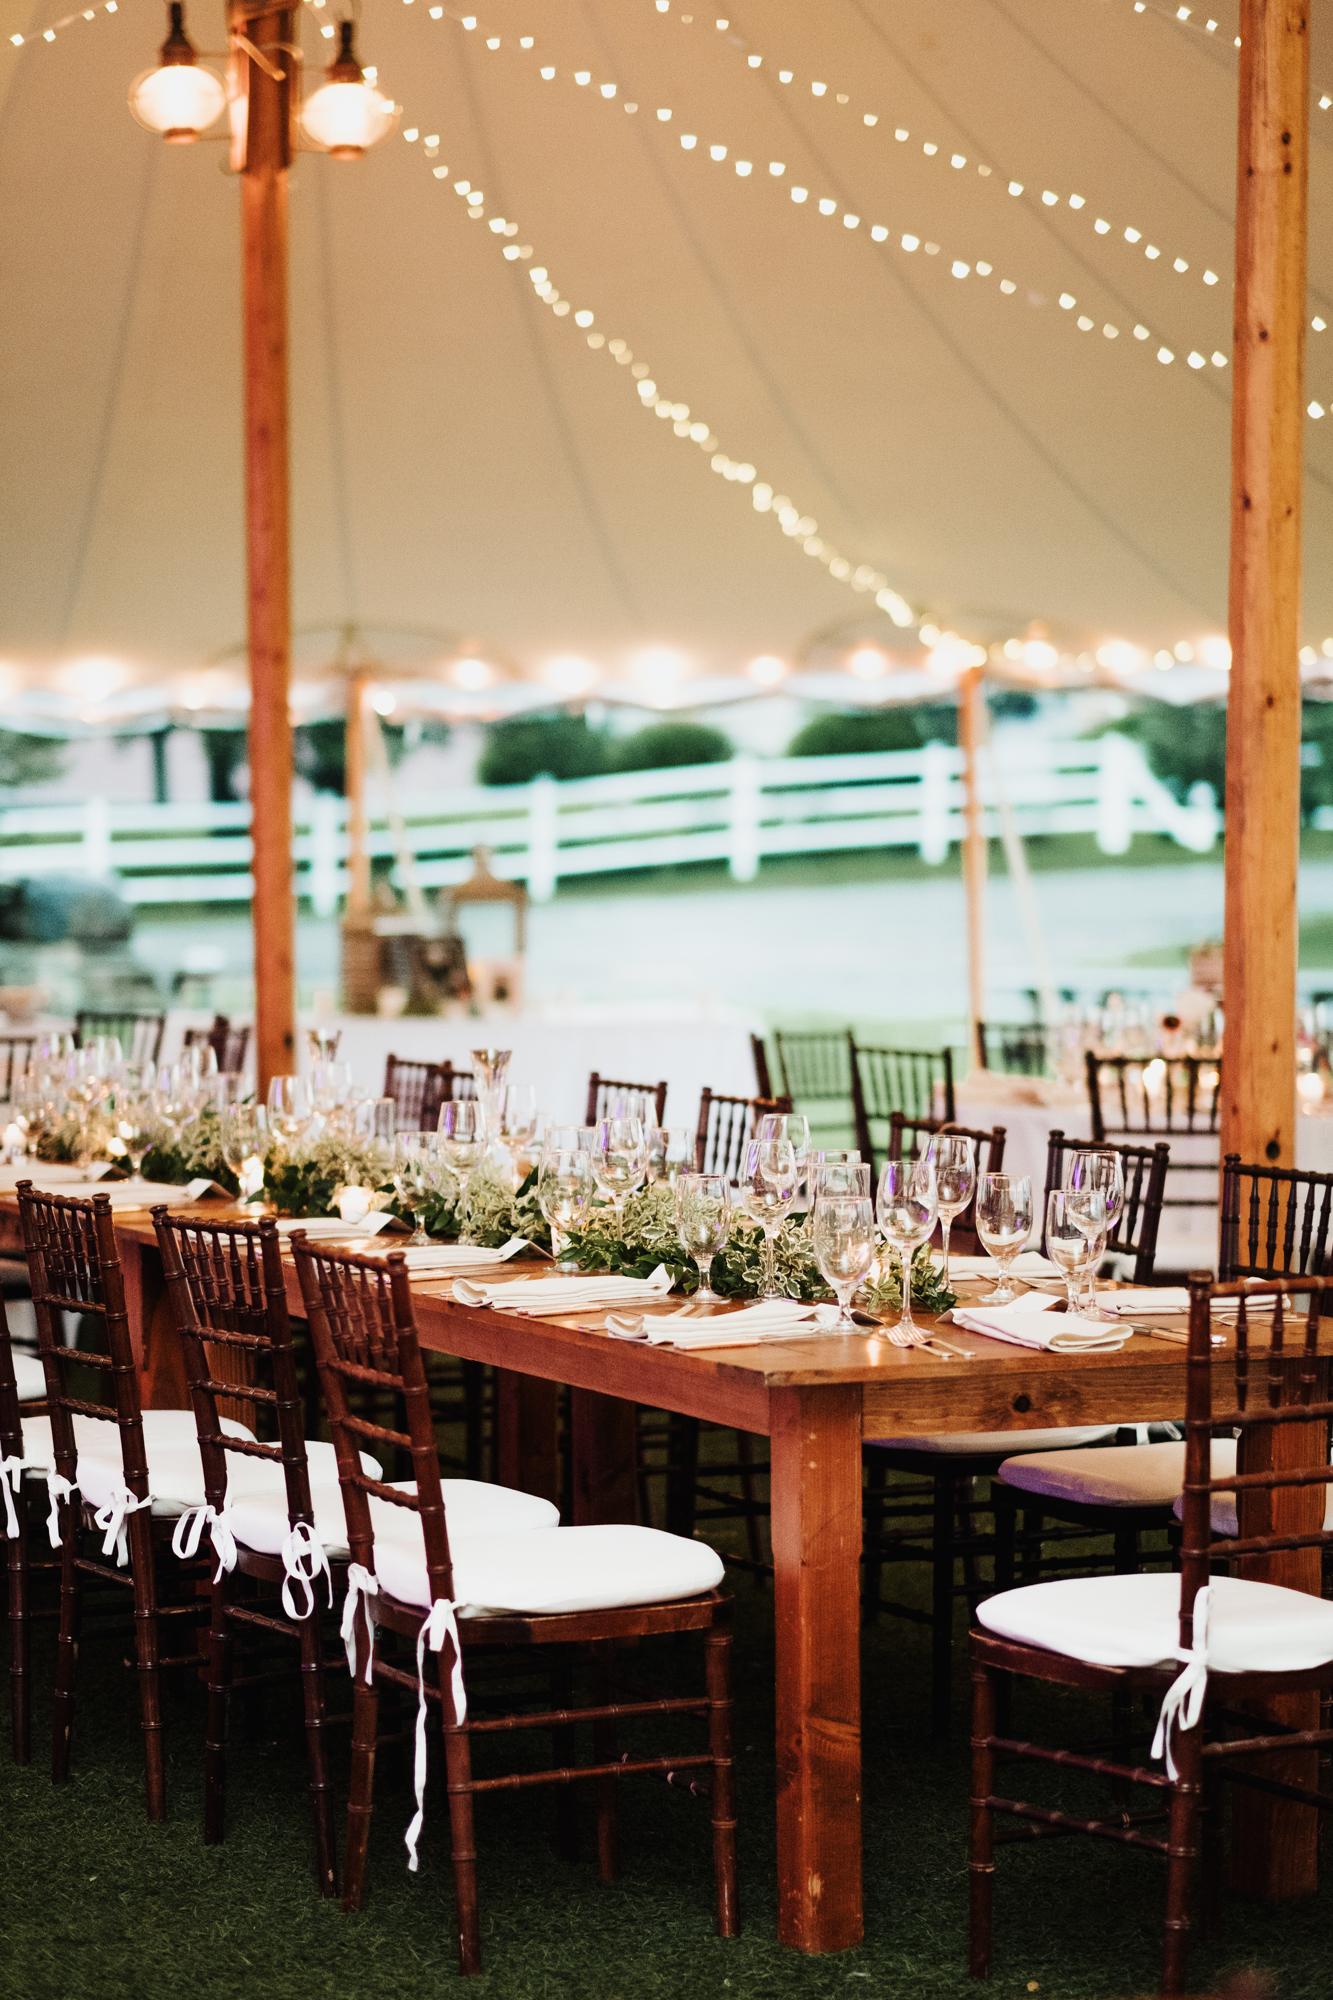 Wedding_Francis_Boucher_Jonathan_Edwards_Winery_2018-49.jpg